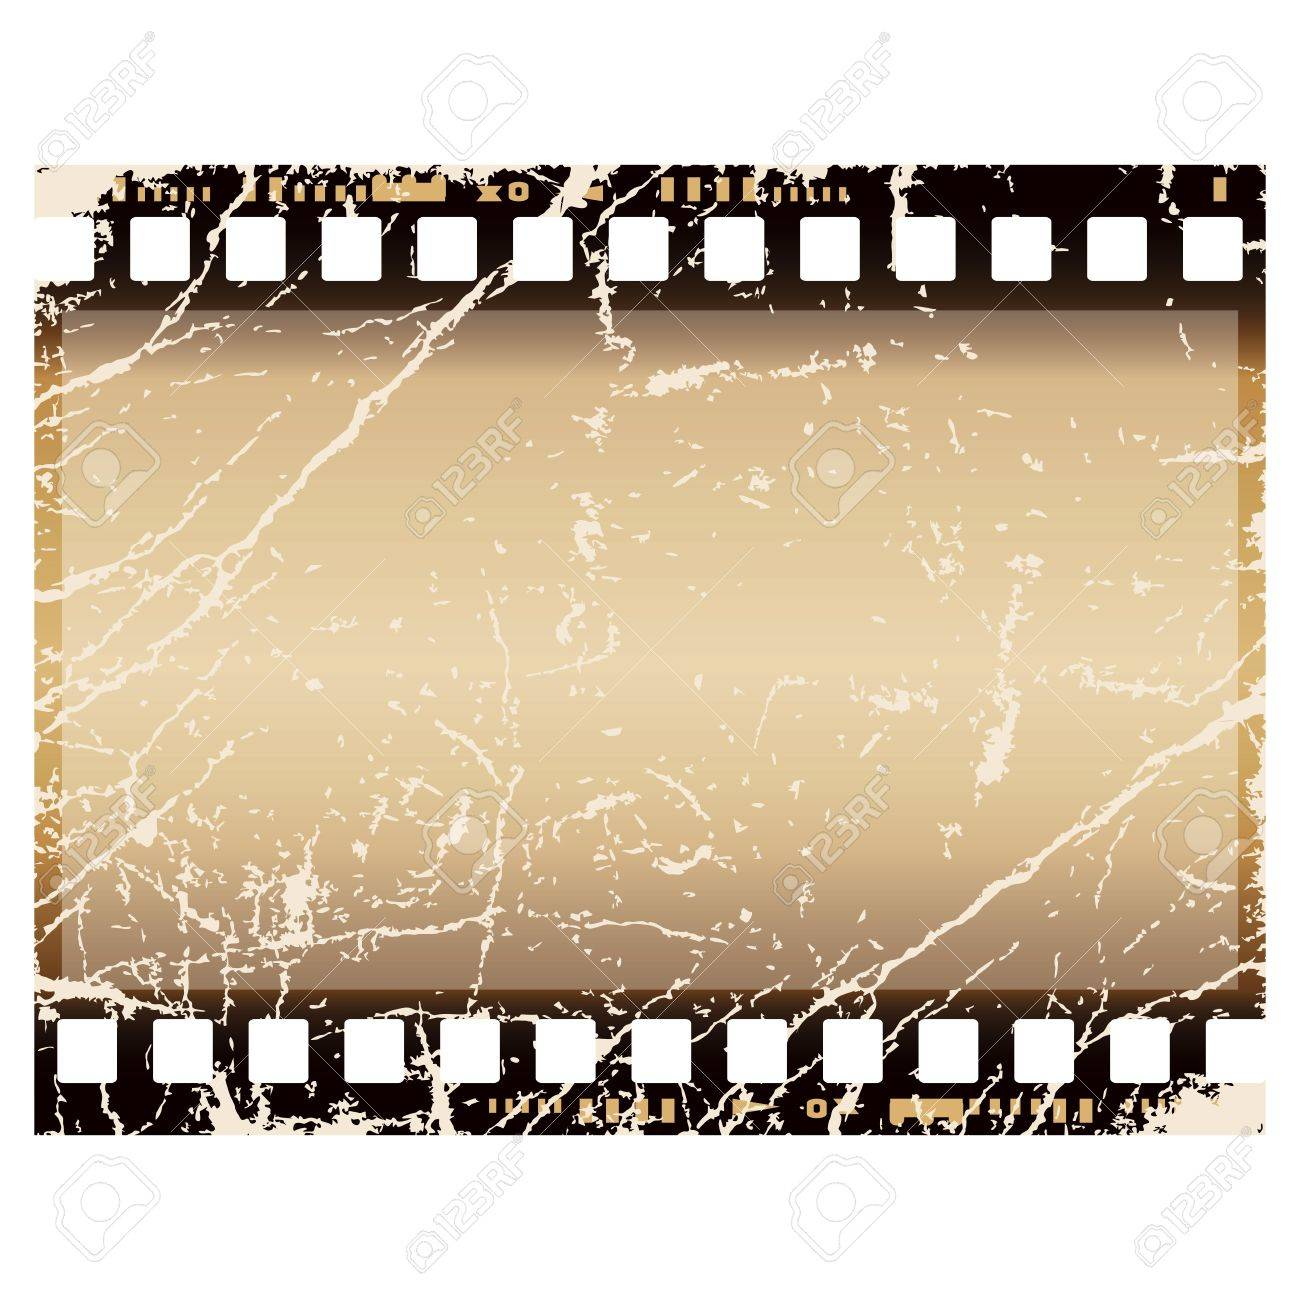 grunge film frame, isolated over white background Stock Photo - 10343699